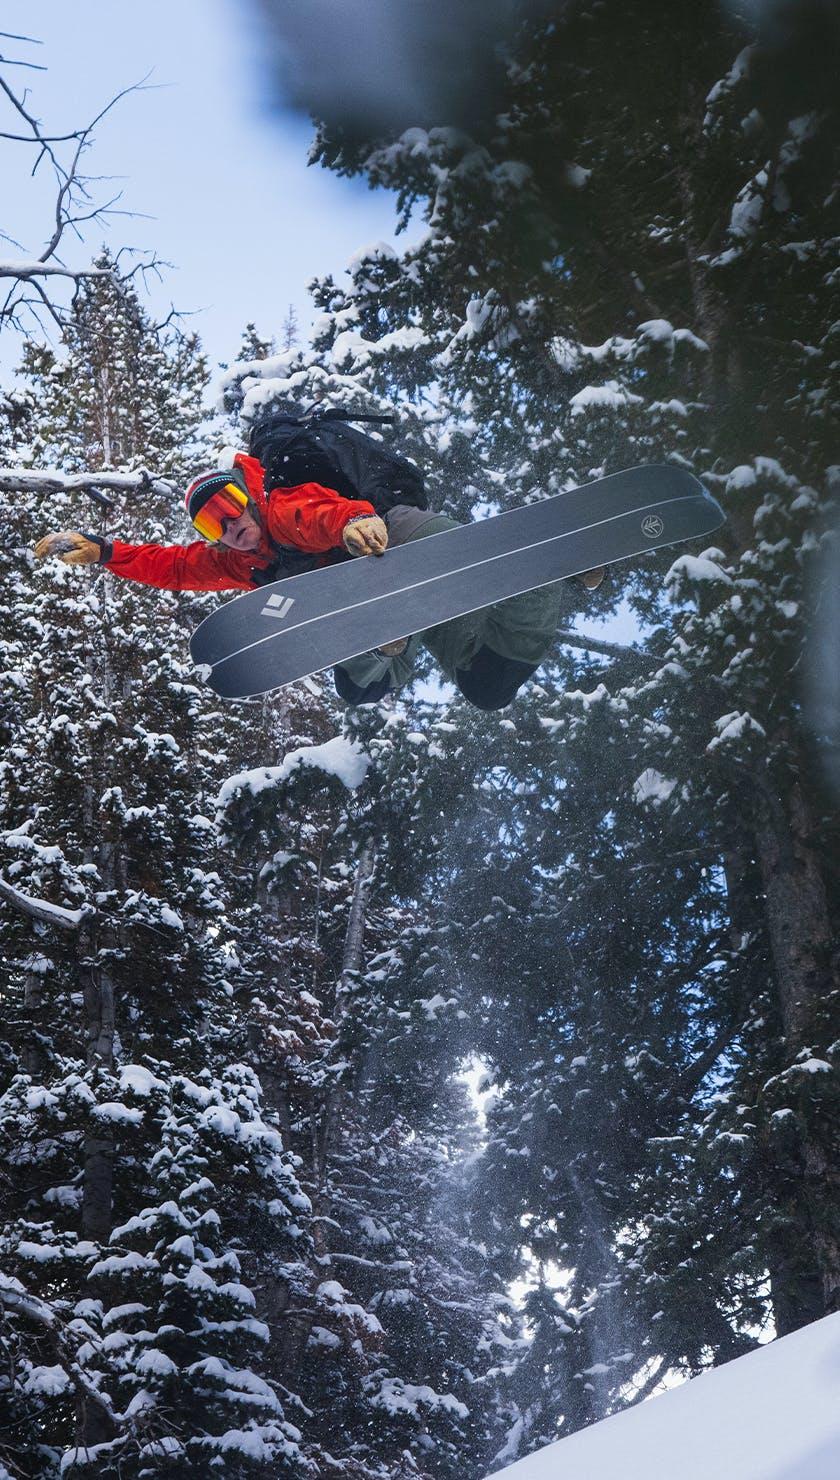 Black Diamond and Cardiff Snowcraft Athlete Bjorn Leines poking a method on his splitboard.